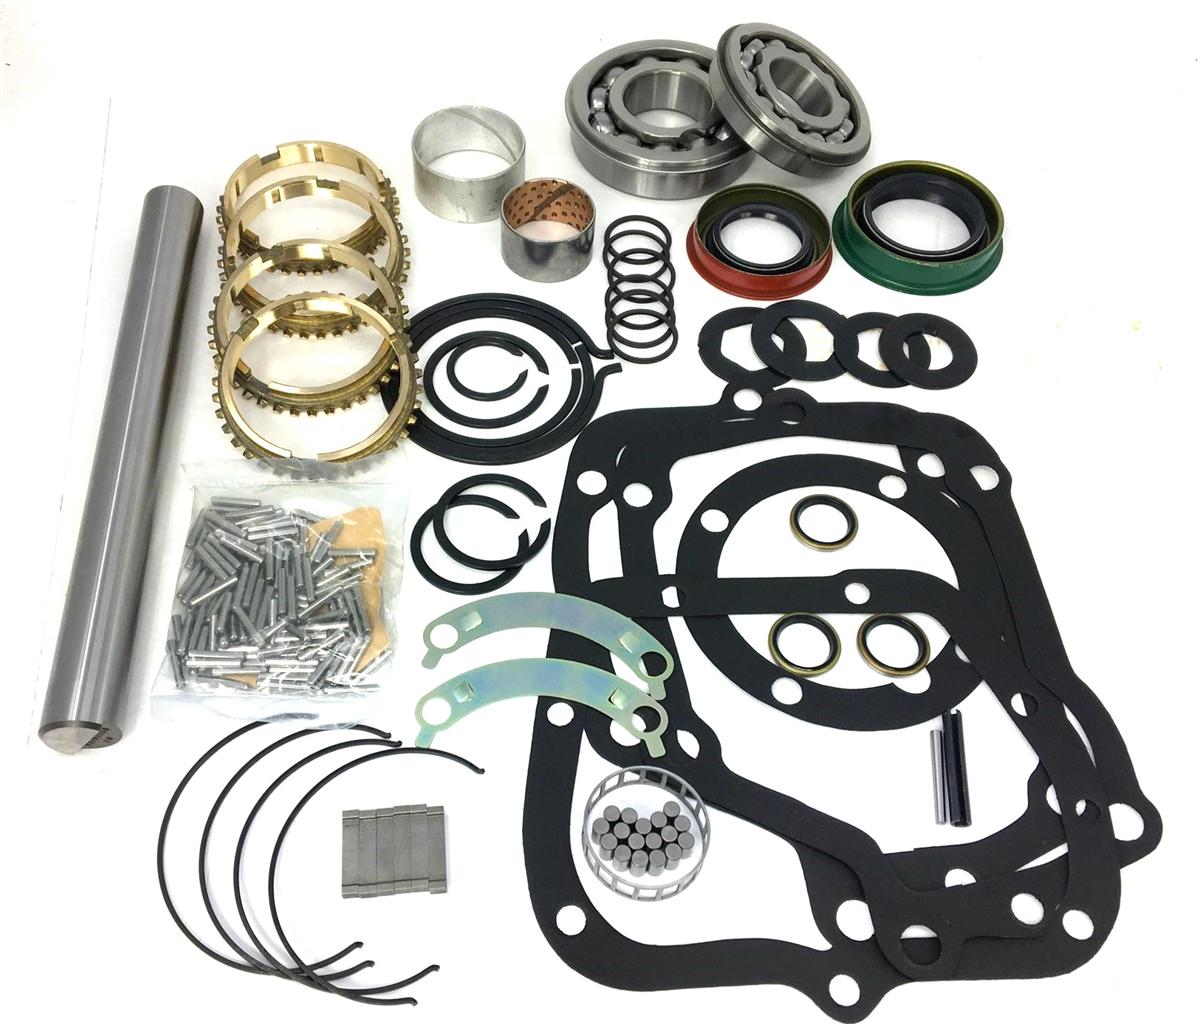 Late Muncie Synchro Rings Explained Geek Tattoos Wiring Diagram 4 Speed Transmission Rebuild Kit Max Load Bearings Bk116ws Parts